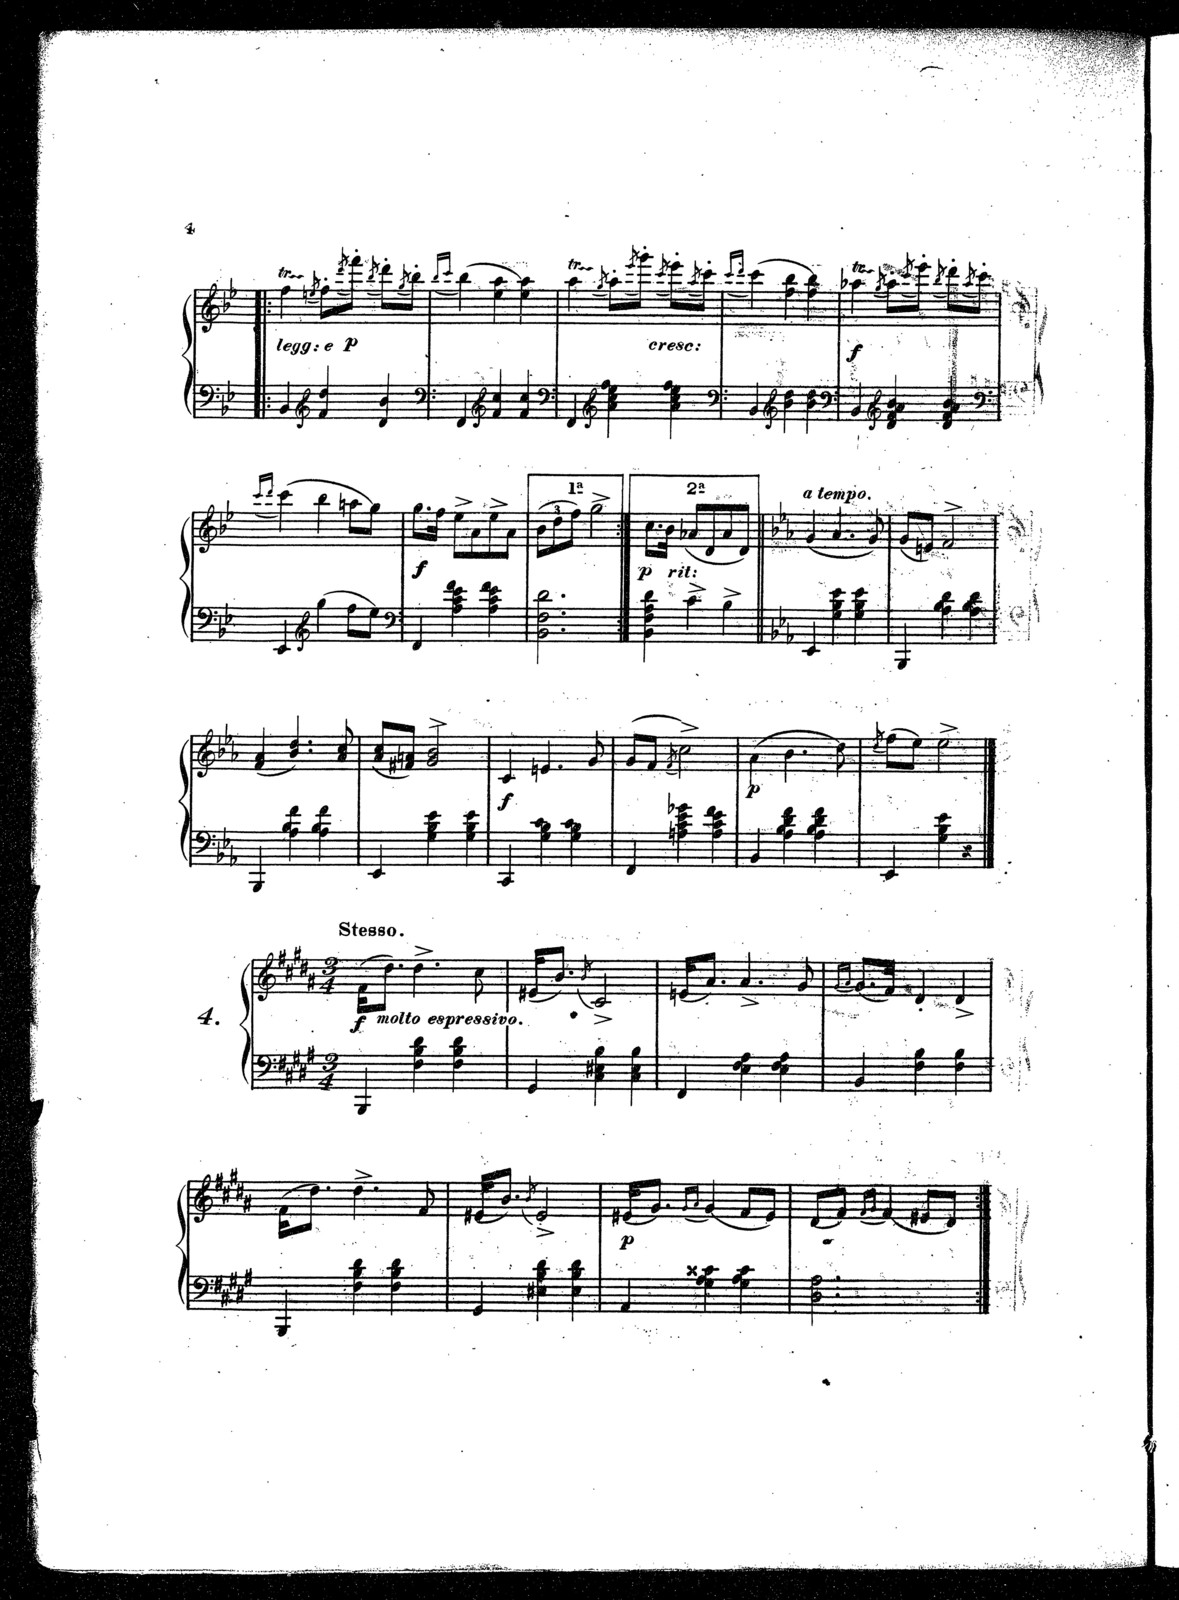 Styriennes, op. 8